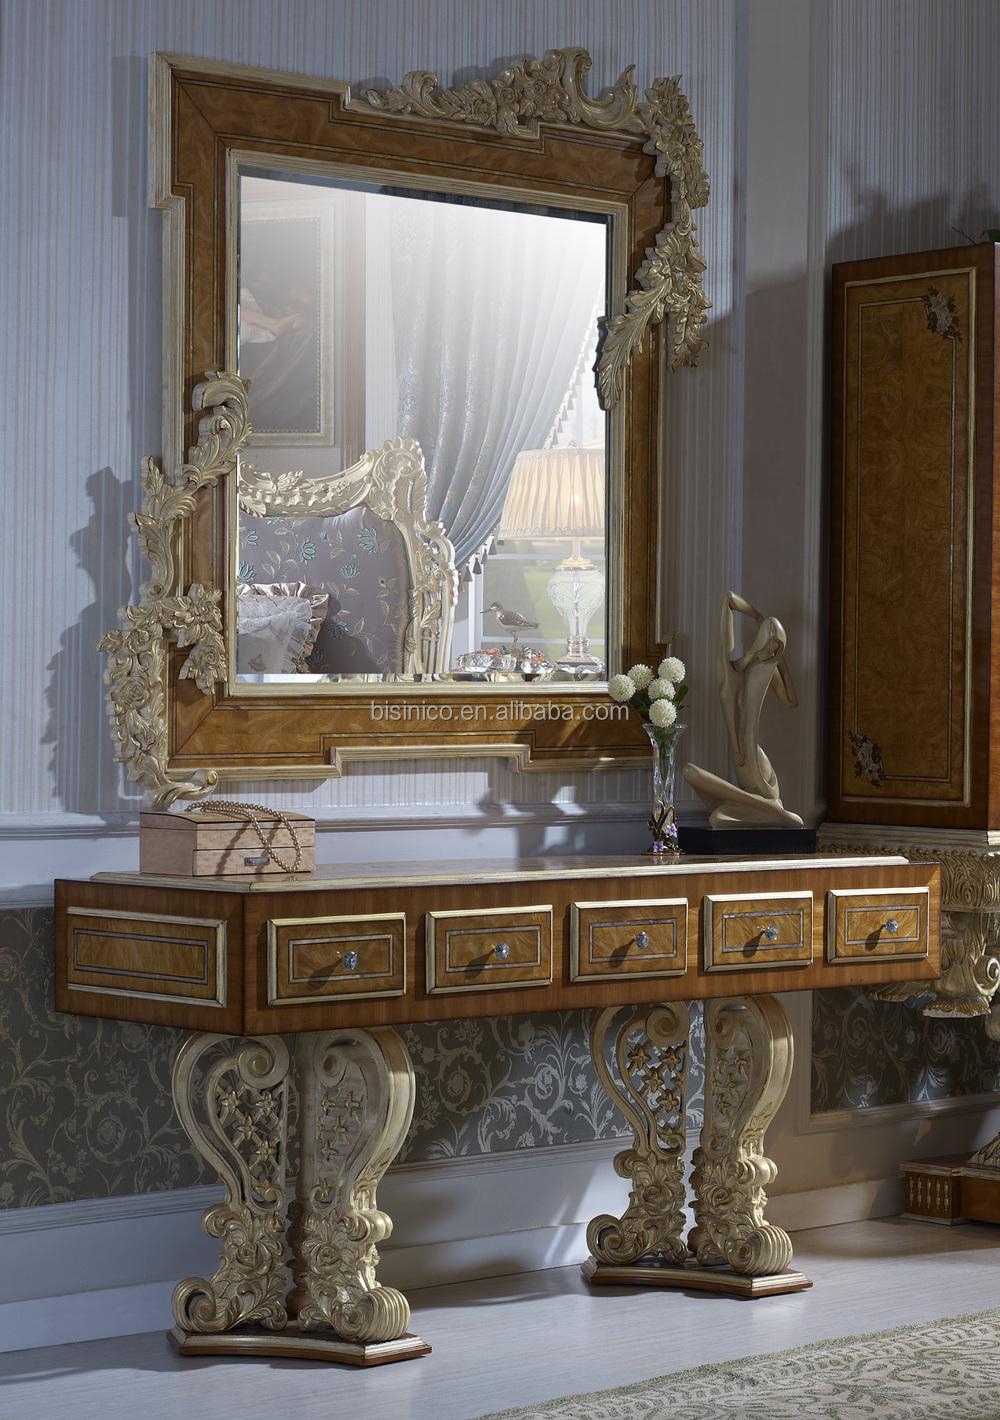 Bisini luxe meubels, slaapkamermeubilair set/italiaanse klassieke ...